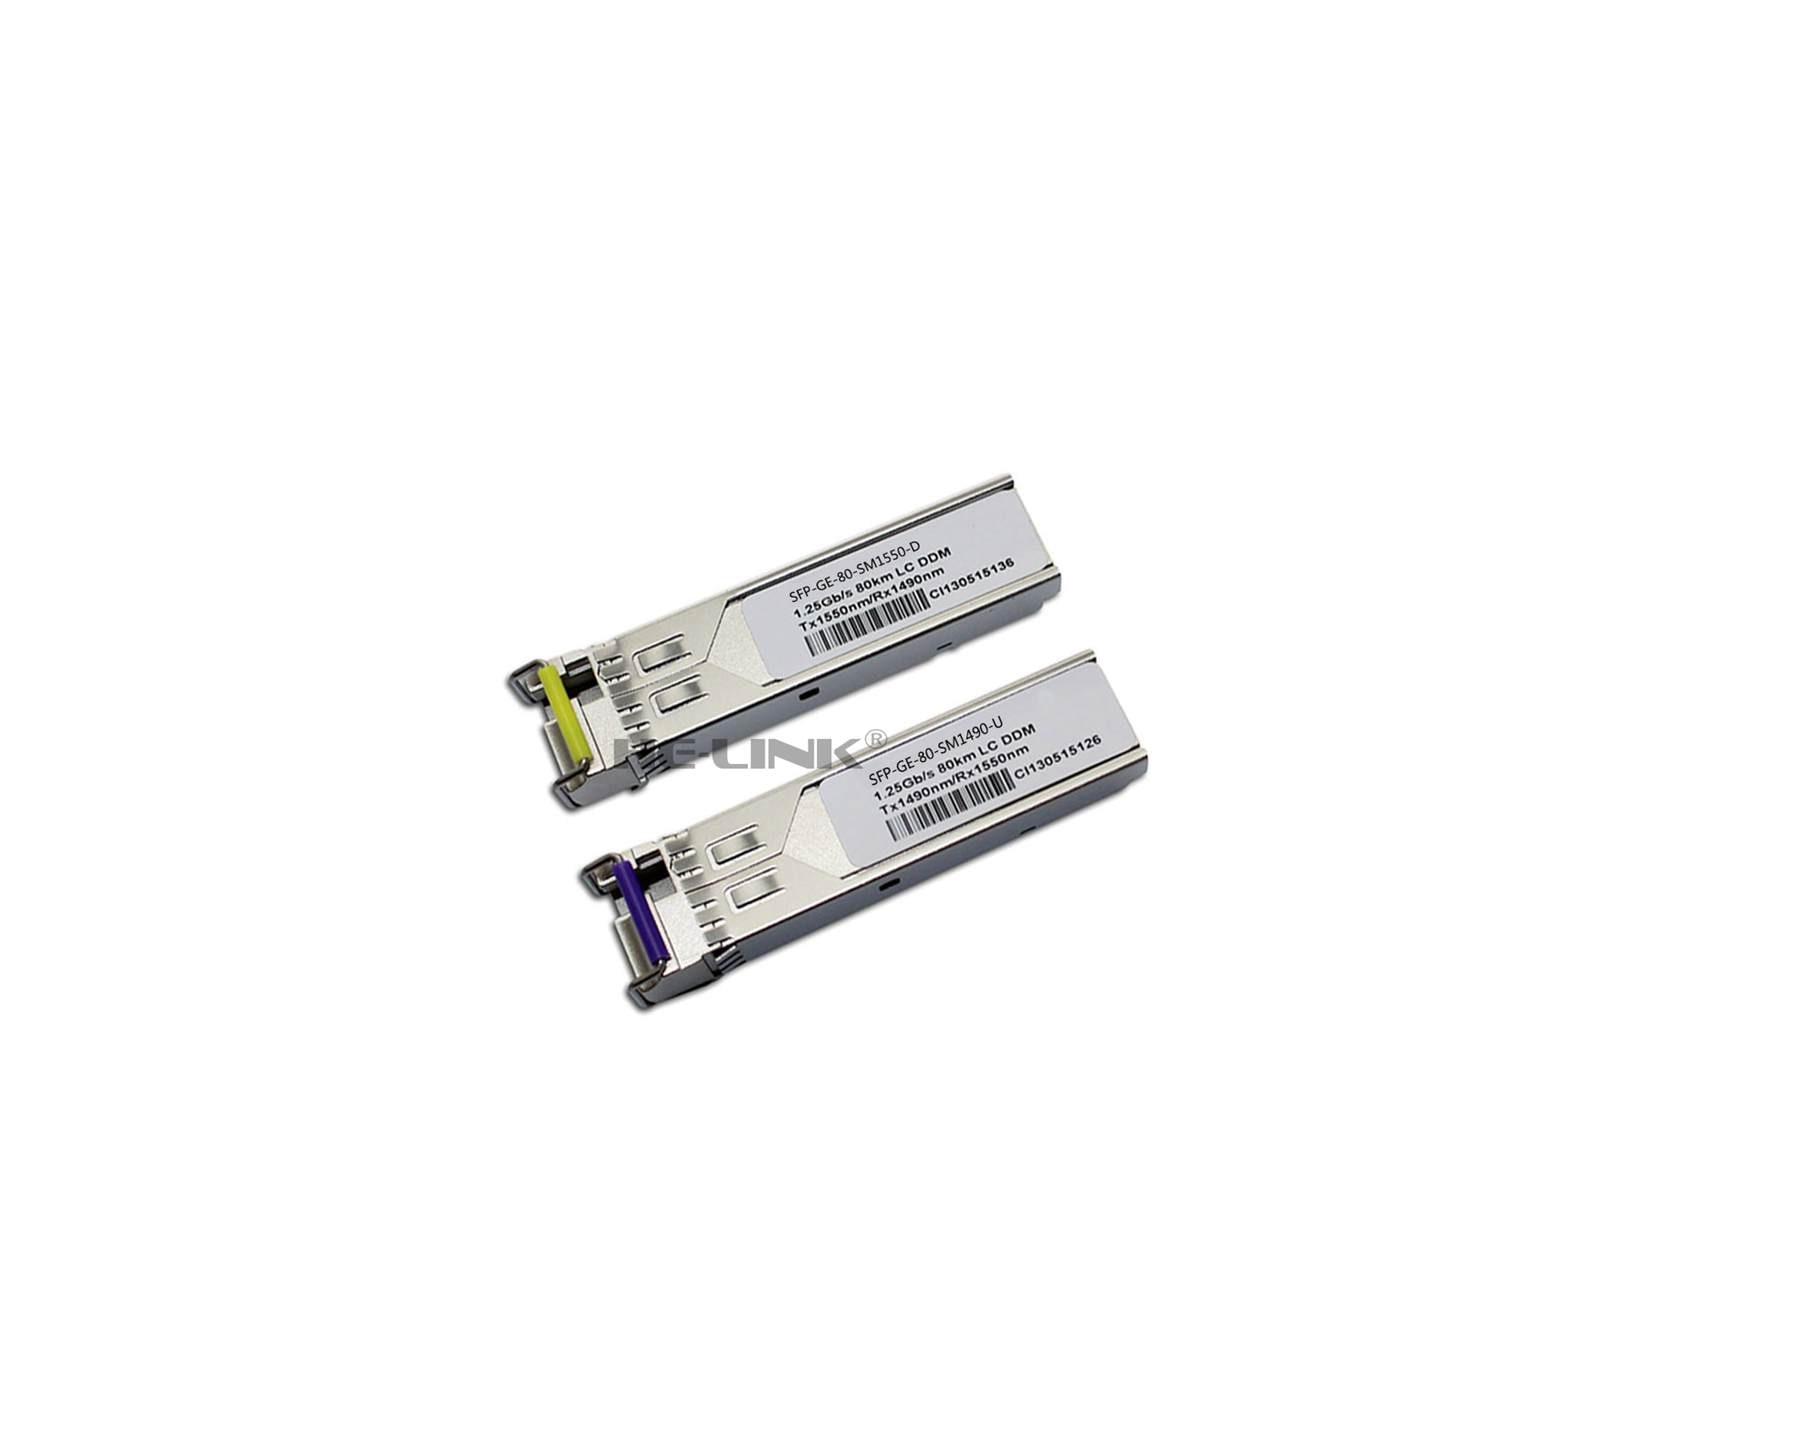 Honest Lodfiber Sfp-ge-80-sm1490-u/sfp-ge-80-sm1550-d Hua-wei Compatible 1.25g 1490/1550nm Bidi 80km Transceiver Cellphones & Telecommunications